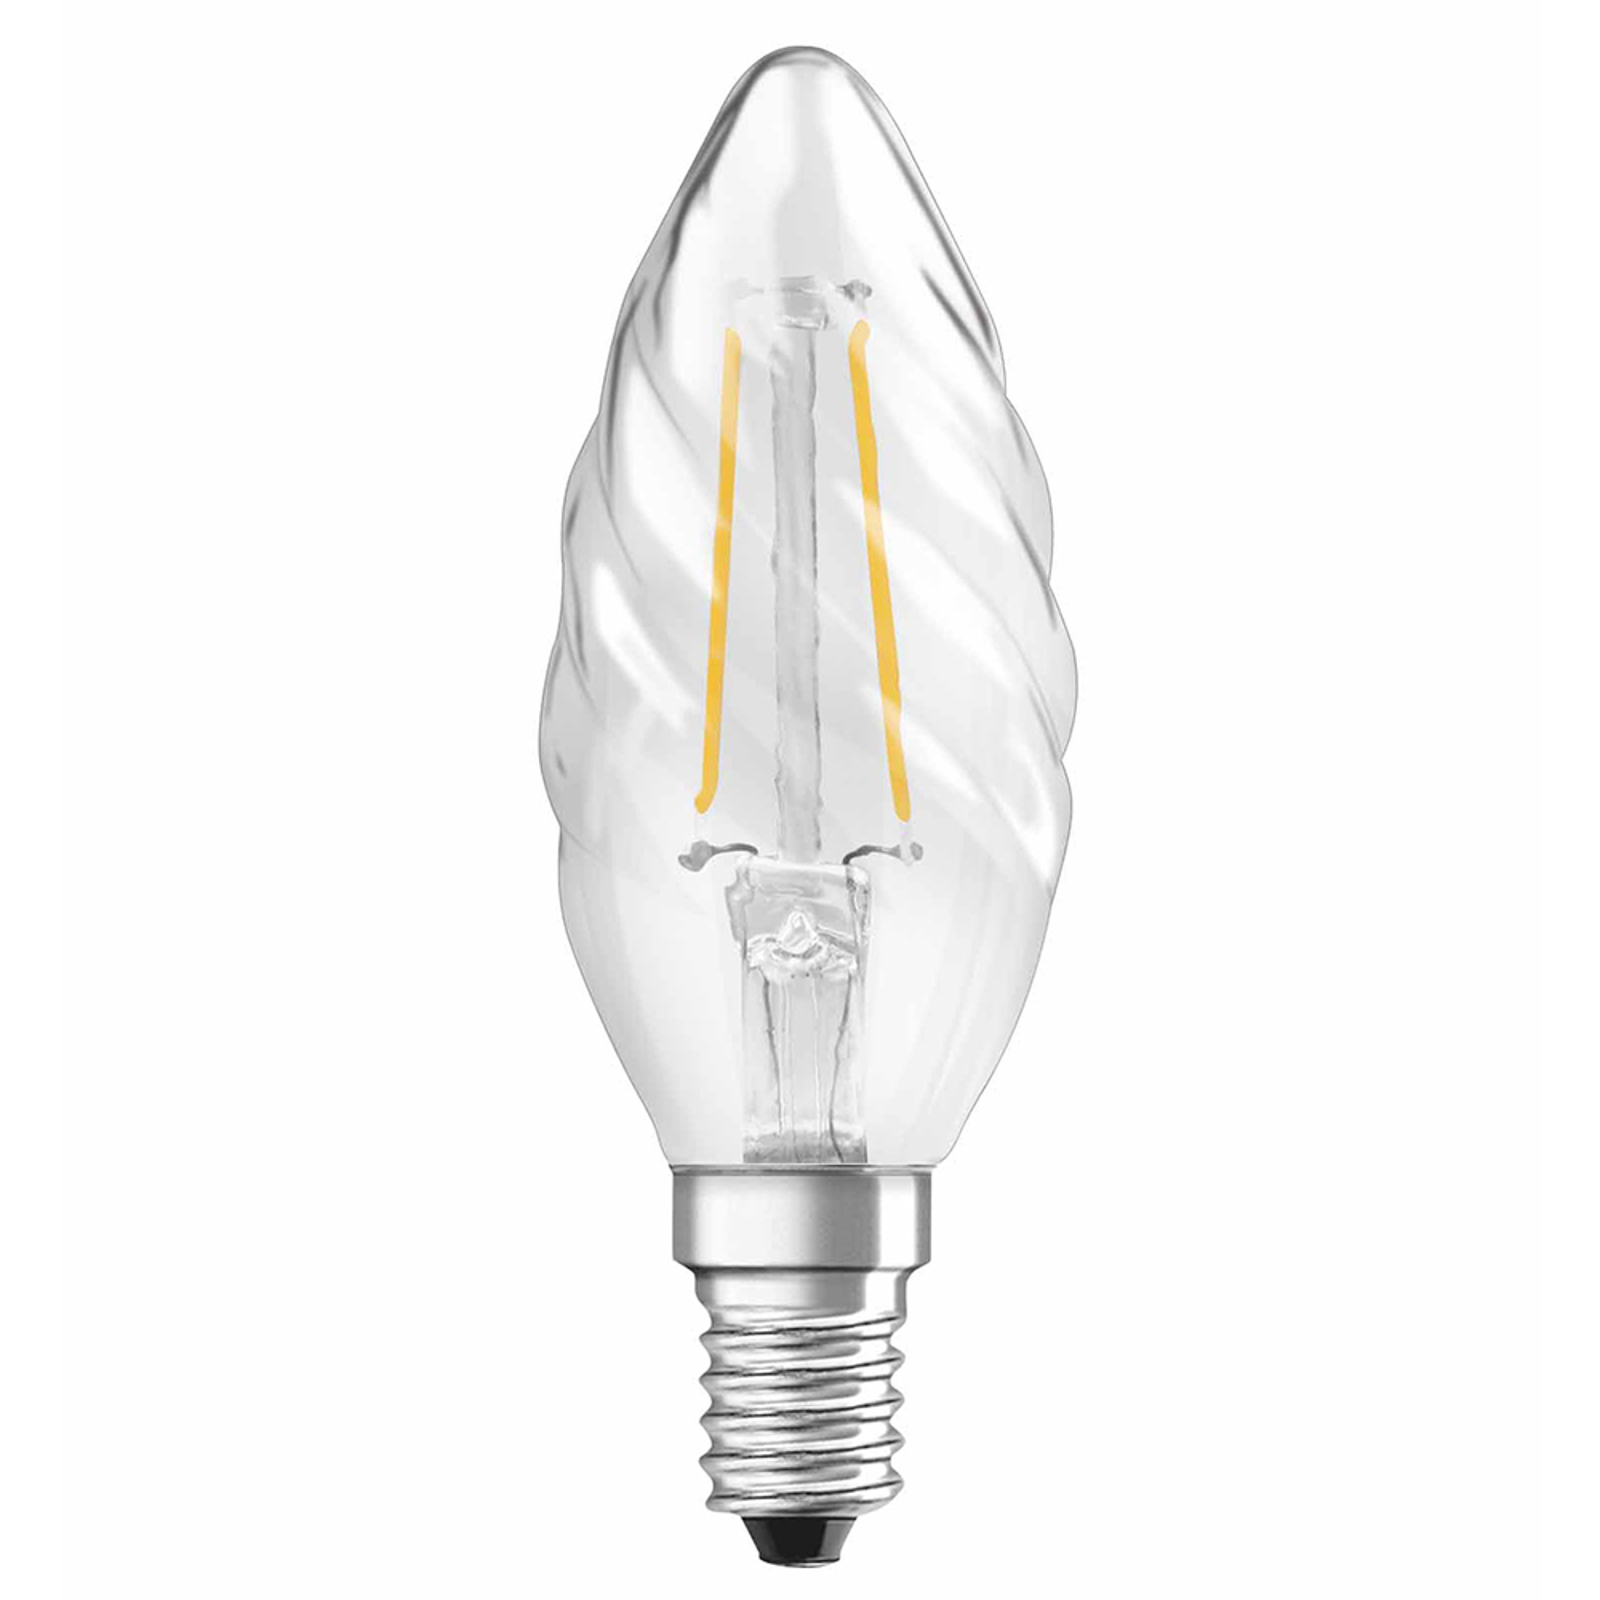 OSRAM-LED-kynttilälamppu E14 2,5W 827 kierretty